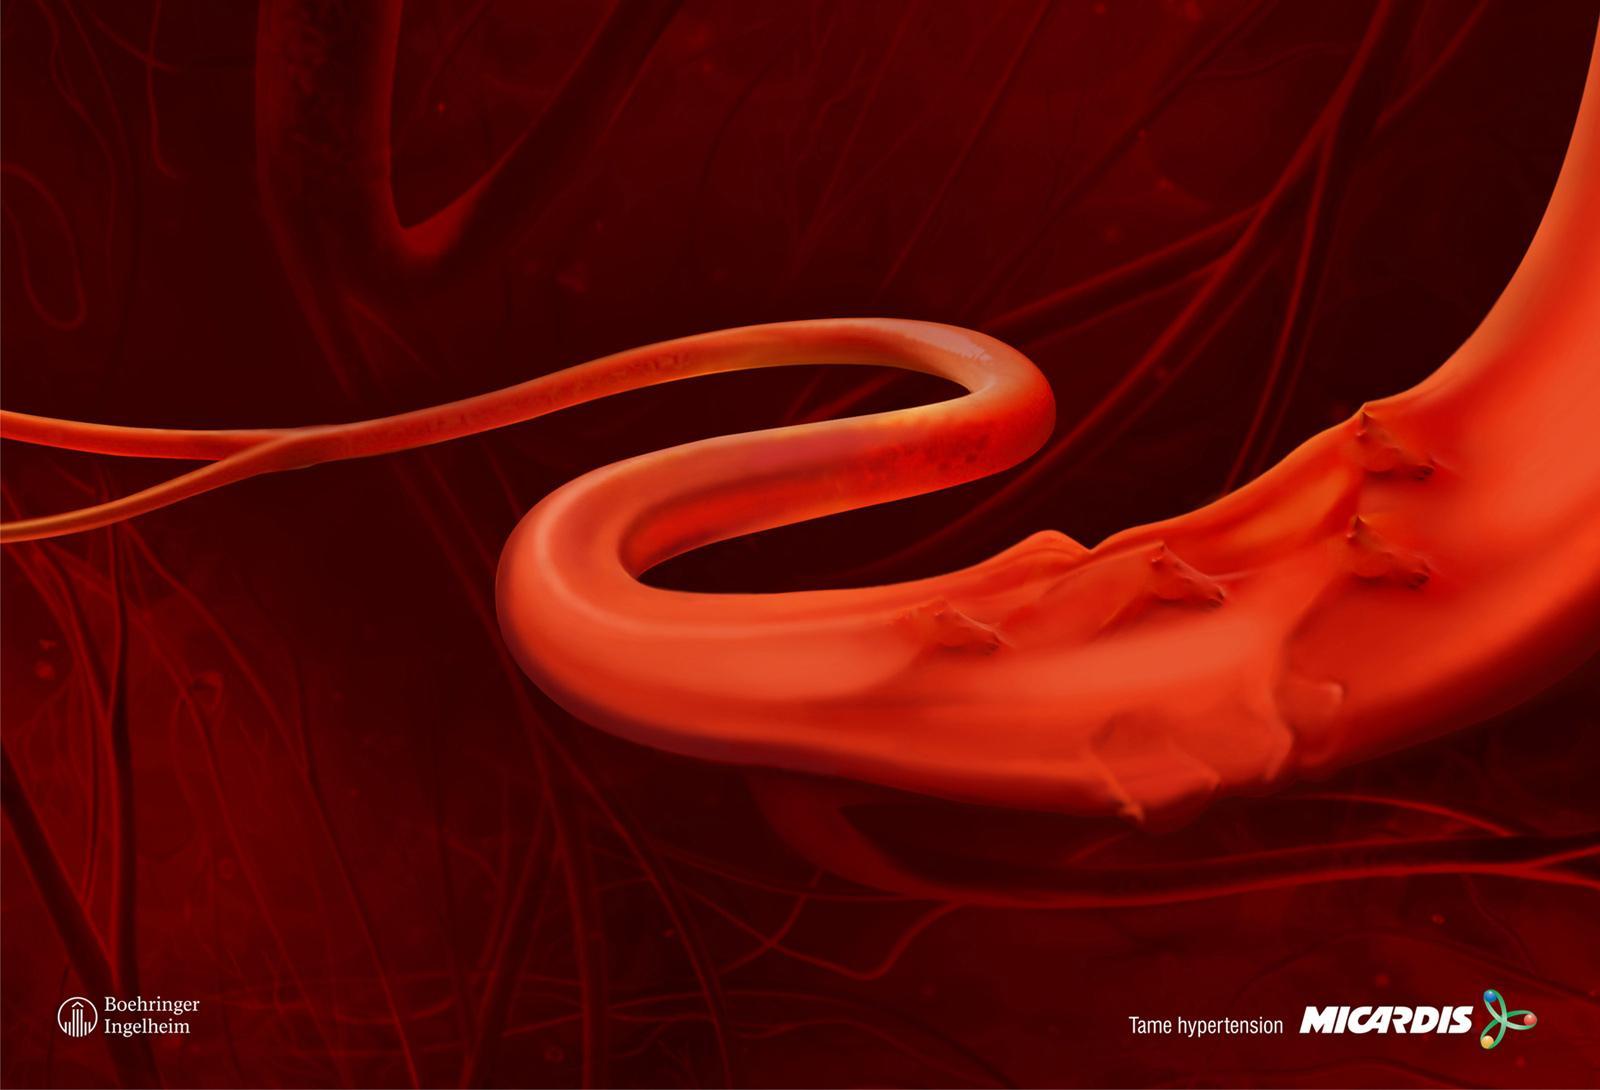 Micardis Print Ad -  Heart